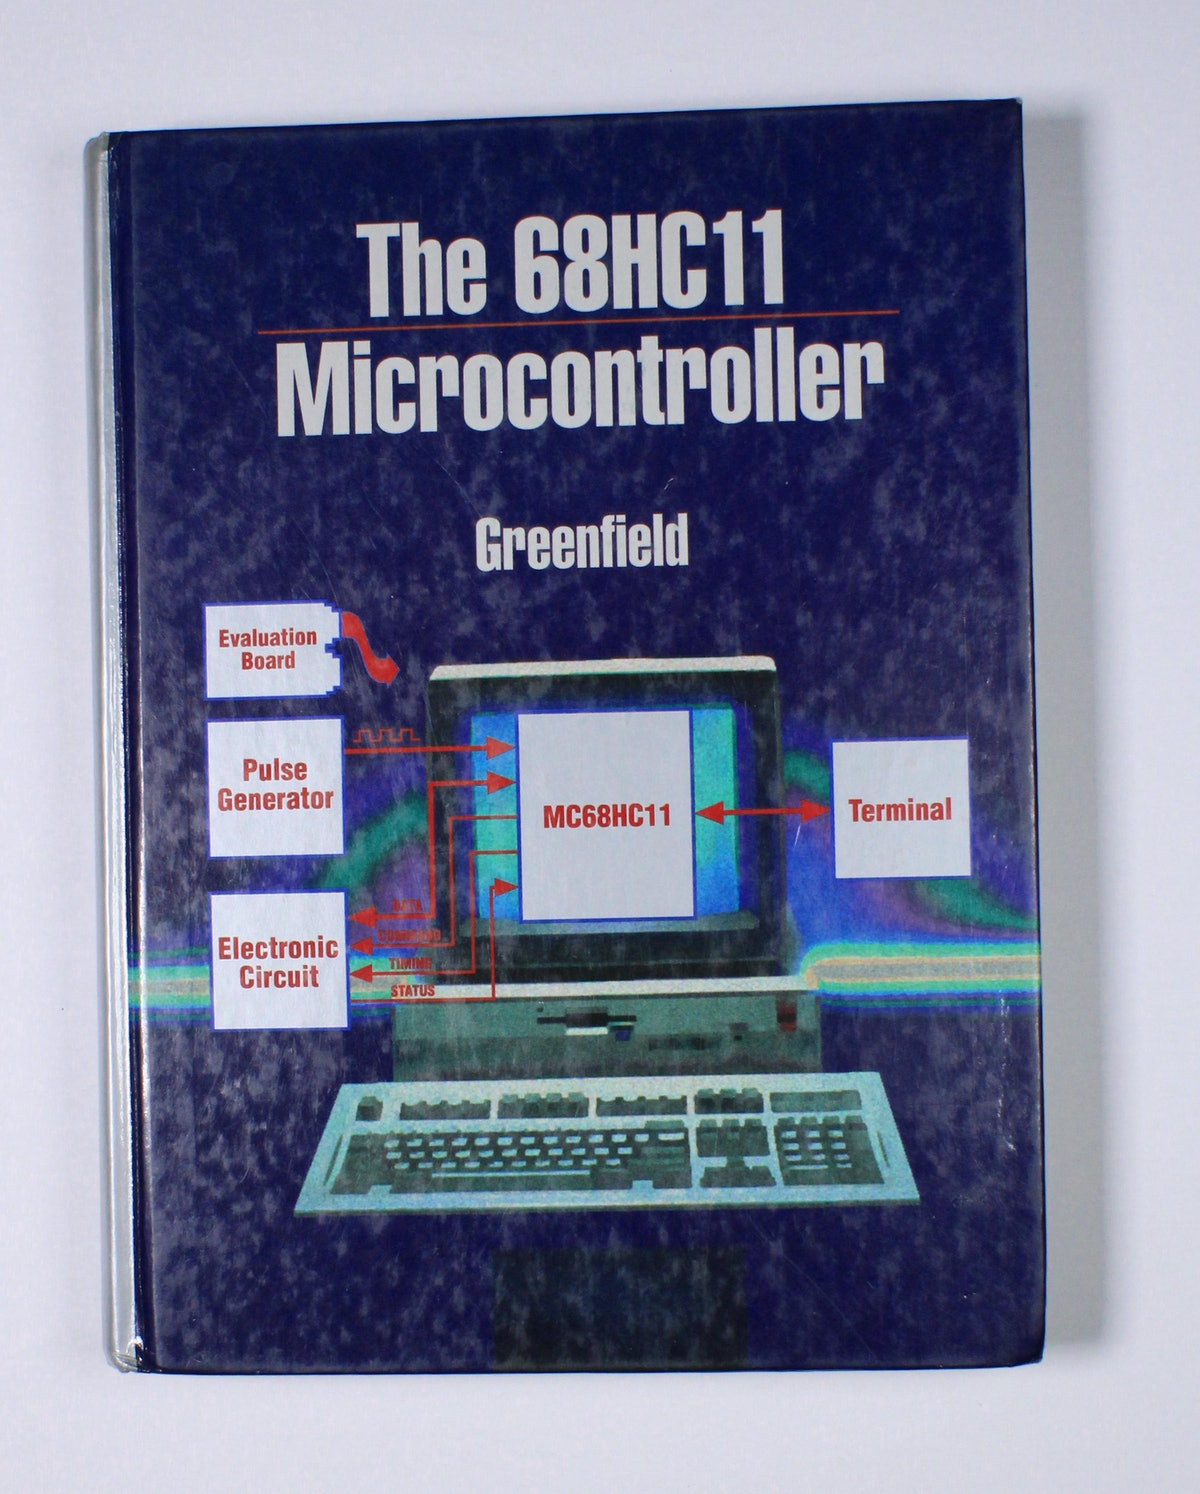 The 68HC11 Microcontroller